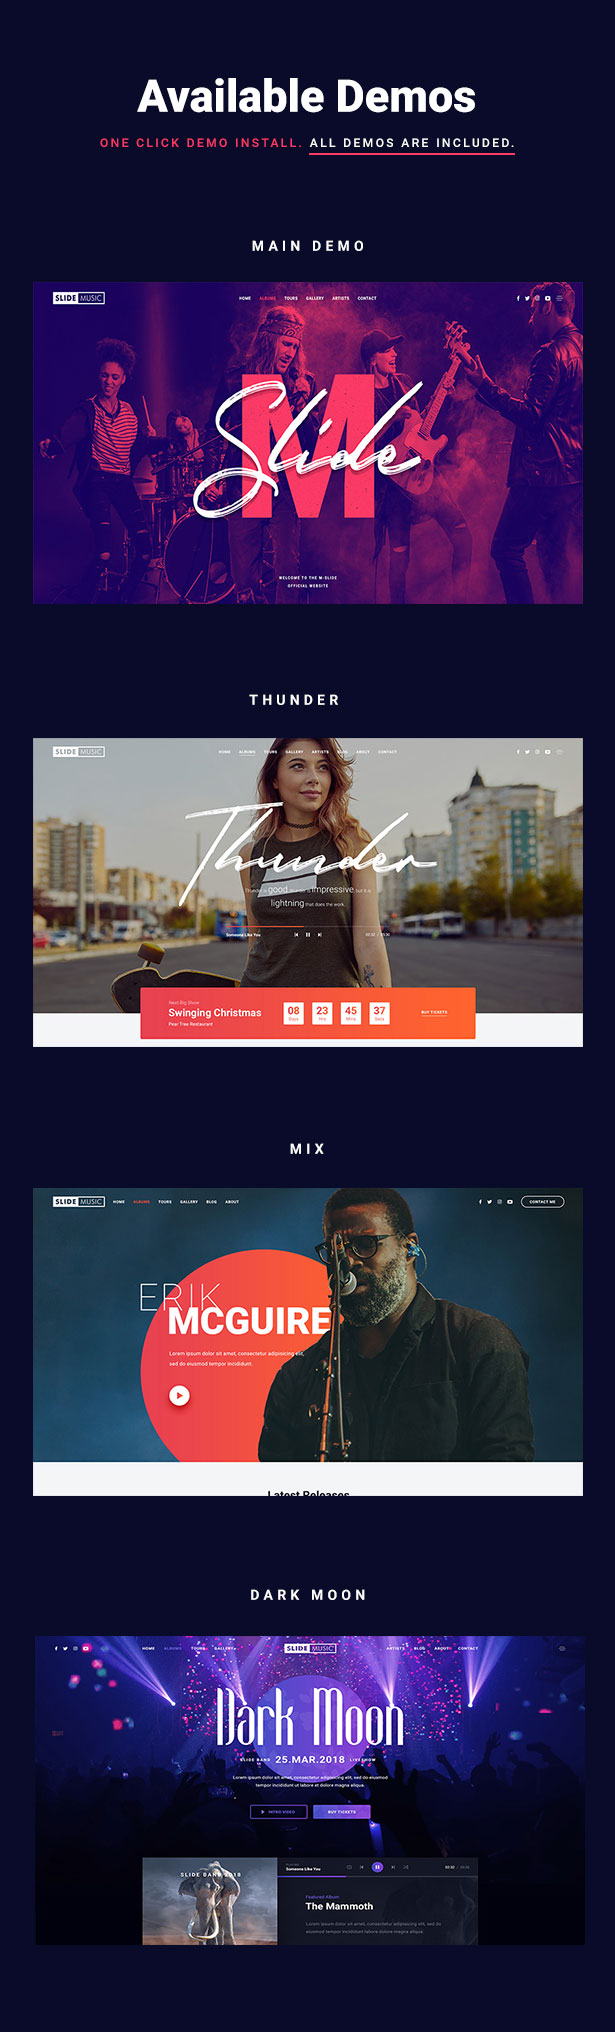 Slide Music WordPress Theme Demos